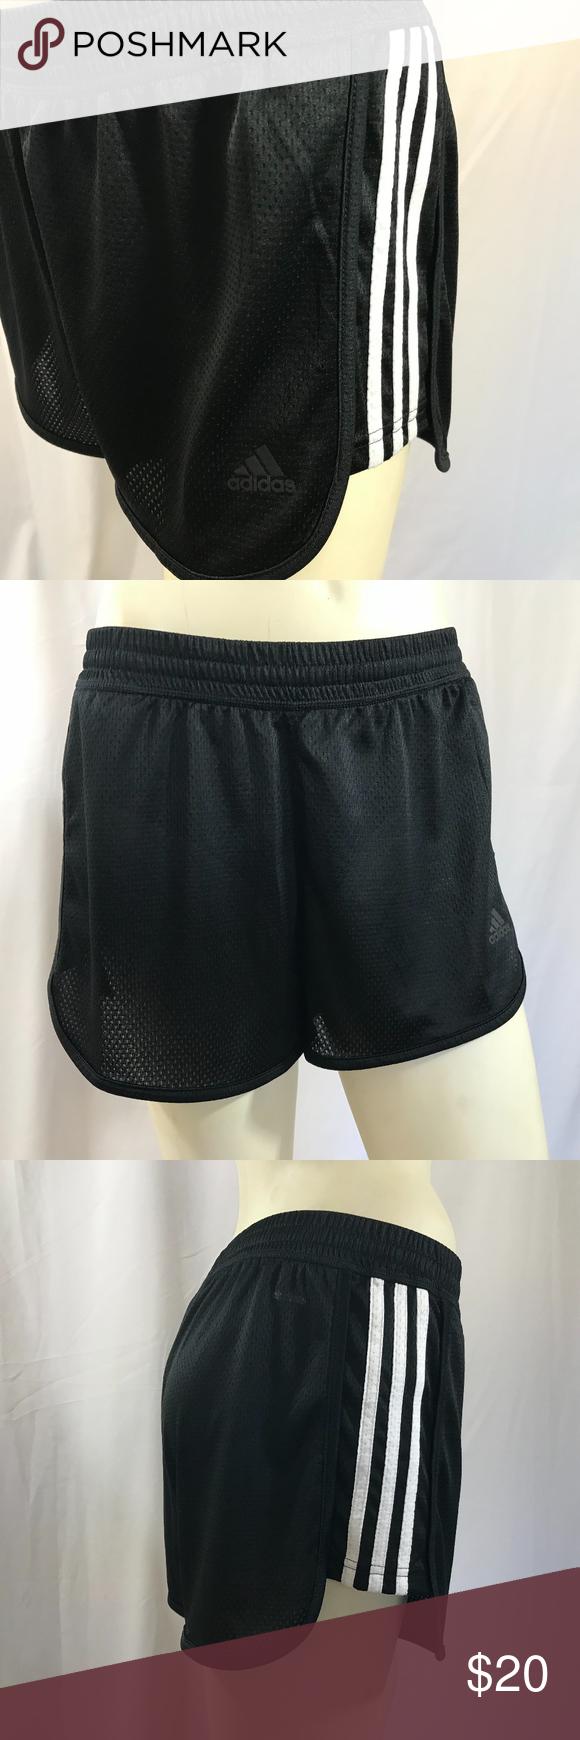 adidas 3 Stripes Dash Womens Knit Short BQ6793 adidas 3